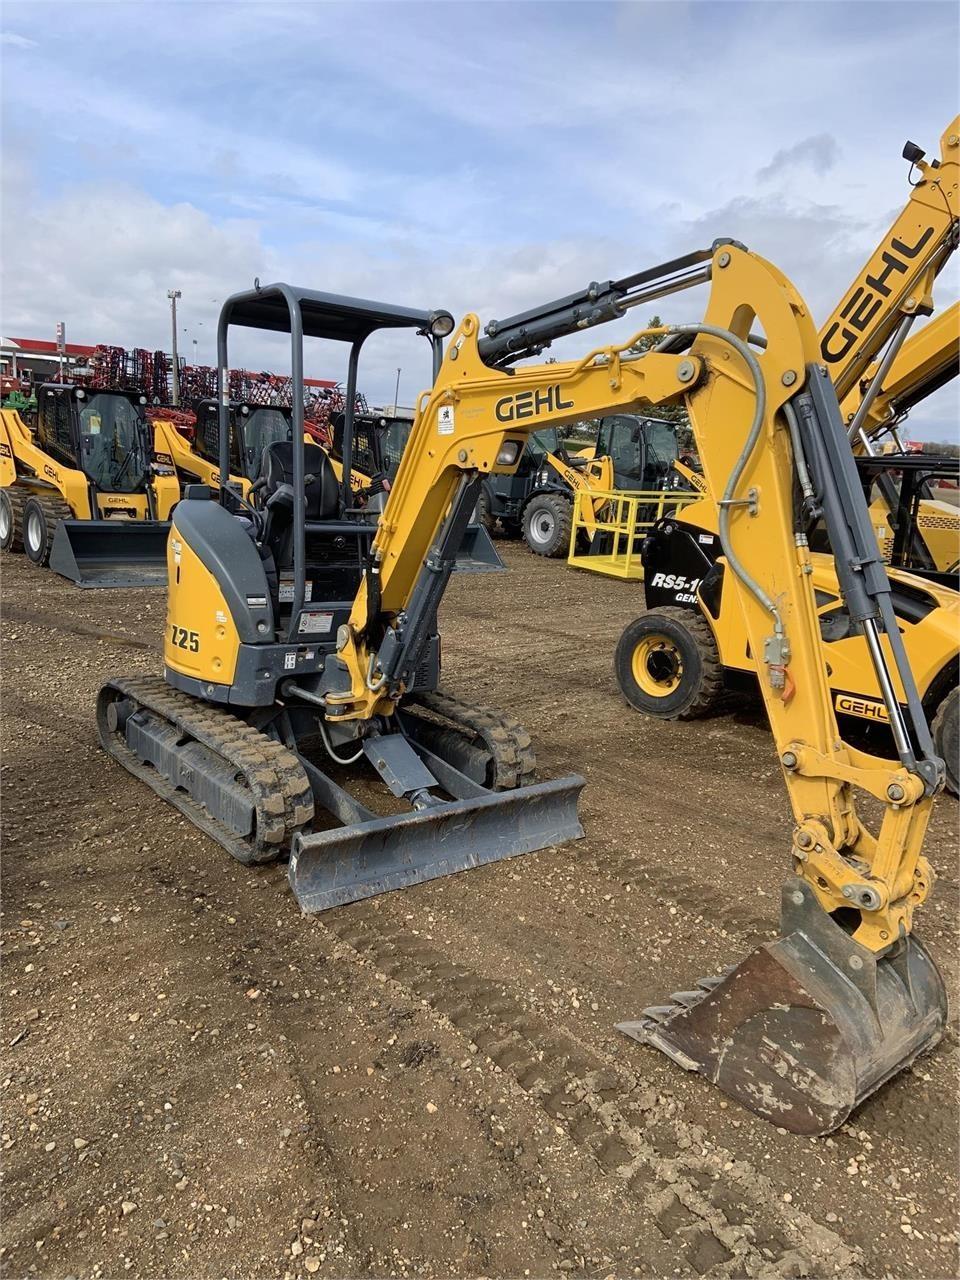 2018 Gehl Z25 Excavators and Mini Excavator